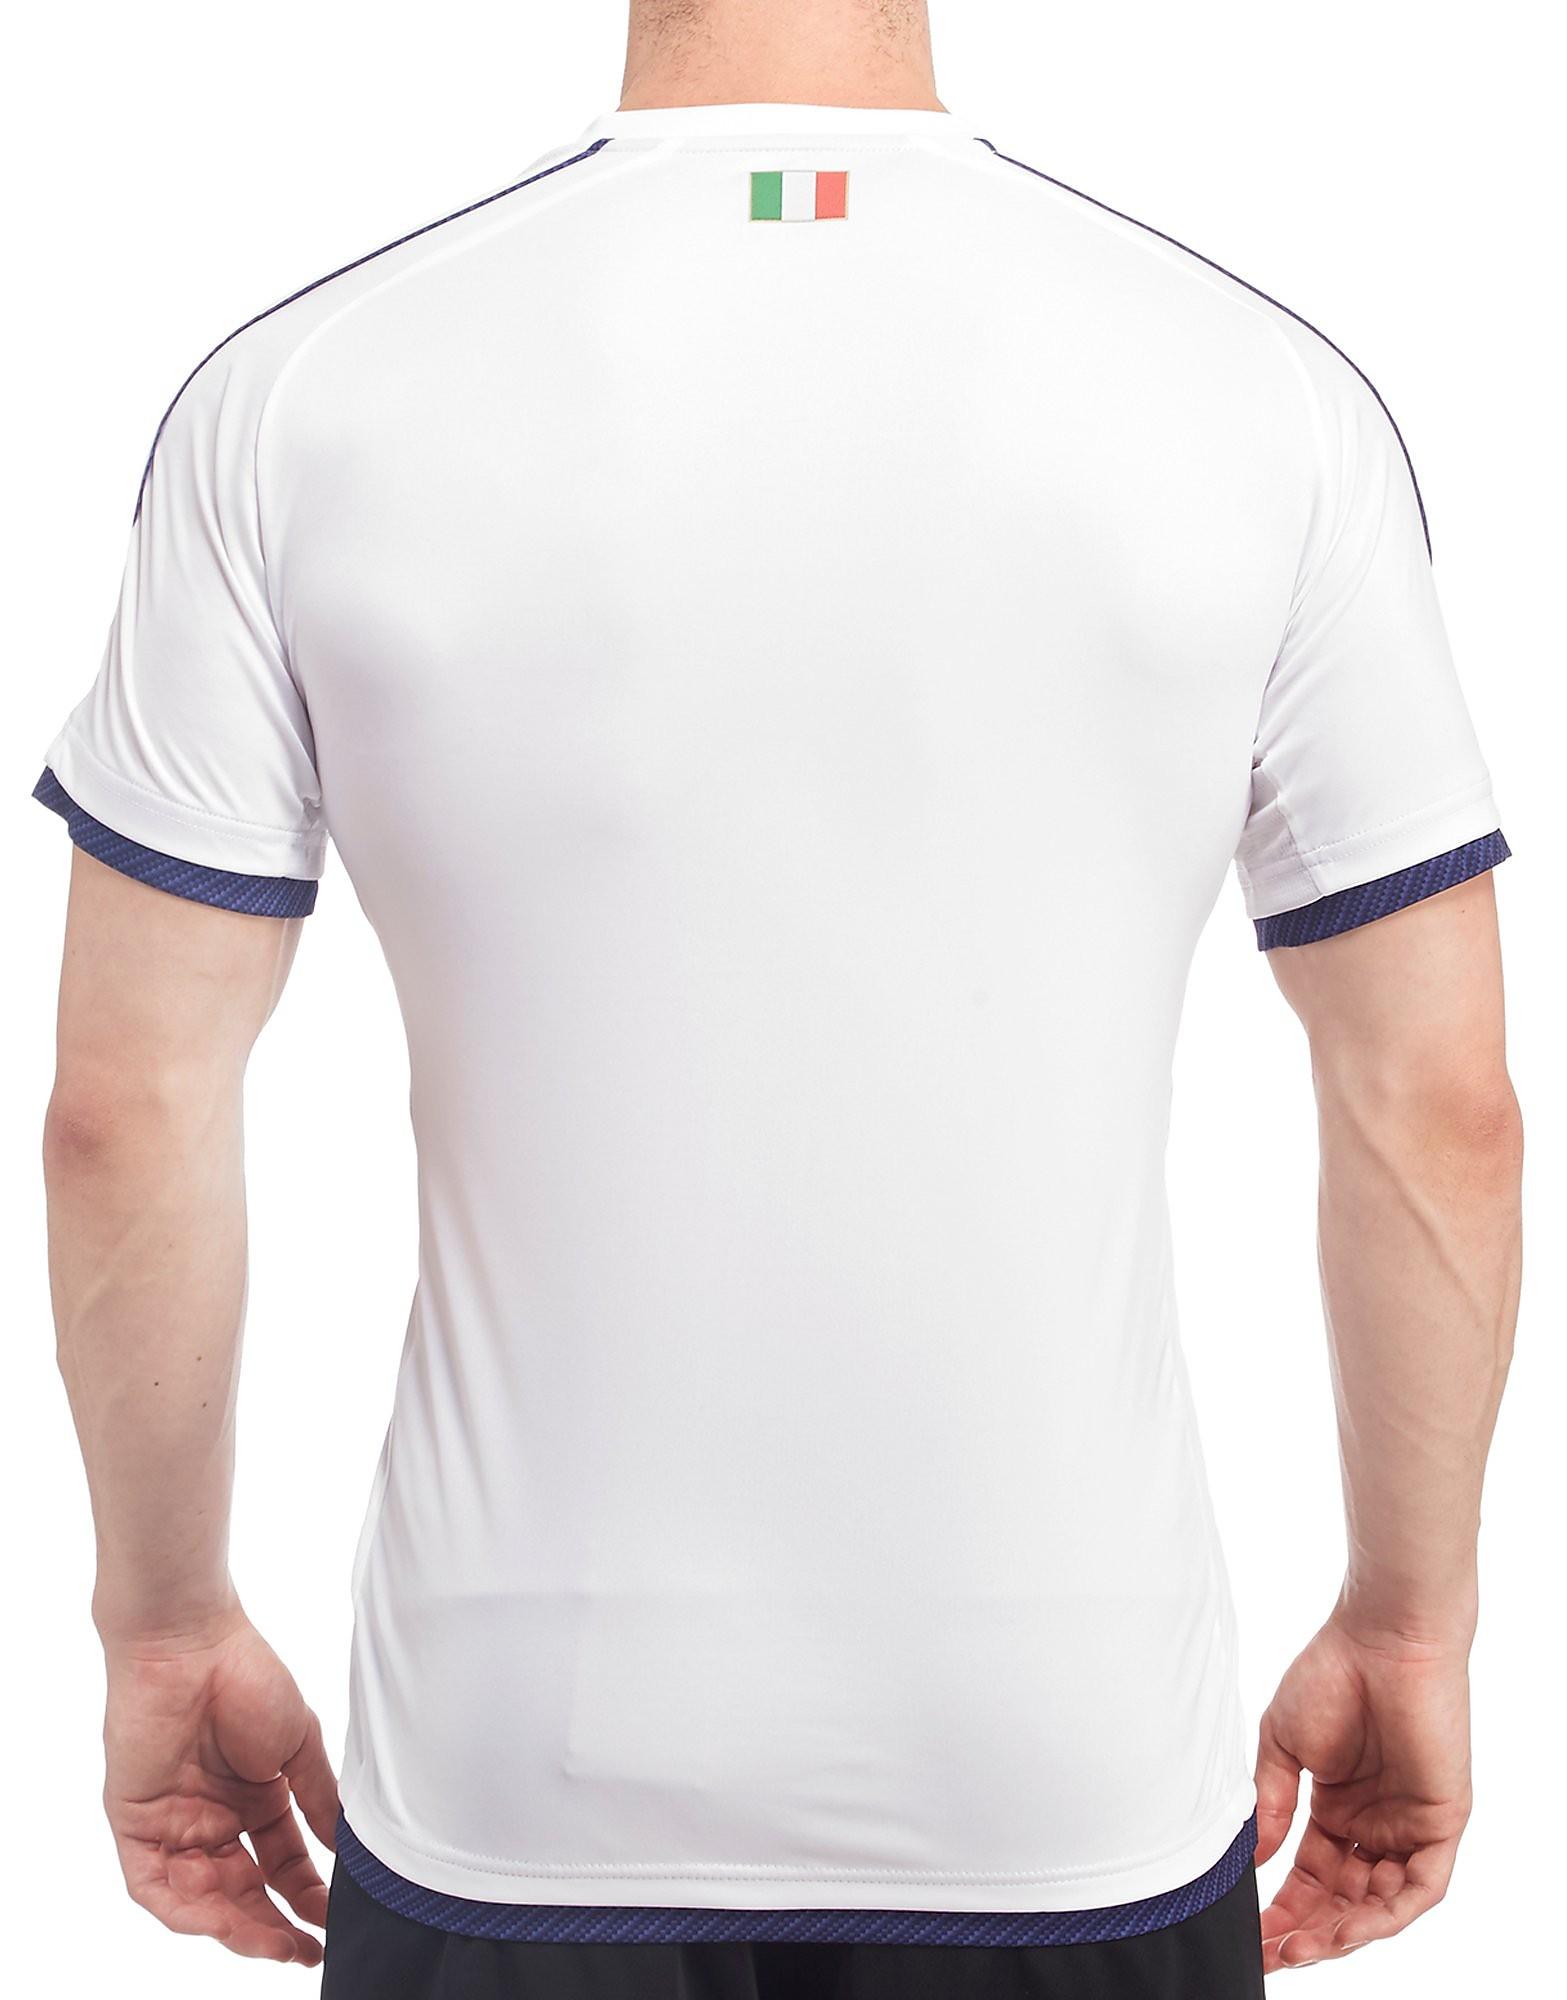 PUMA Italy 2016/17 Away Shirt PRE ORDER